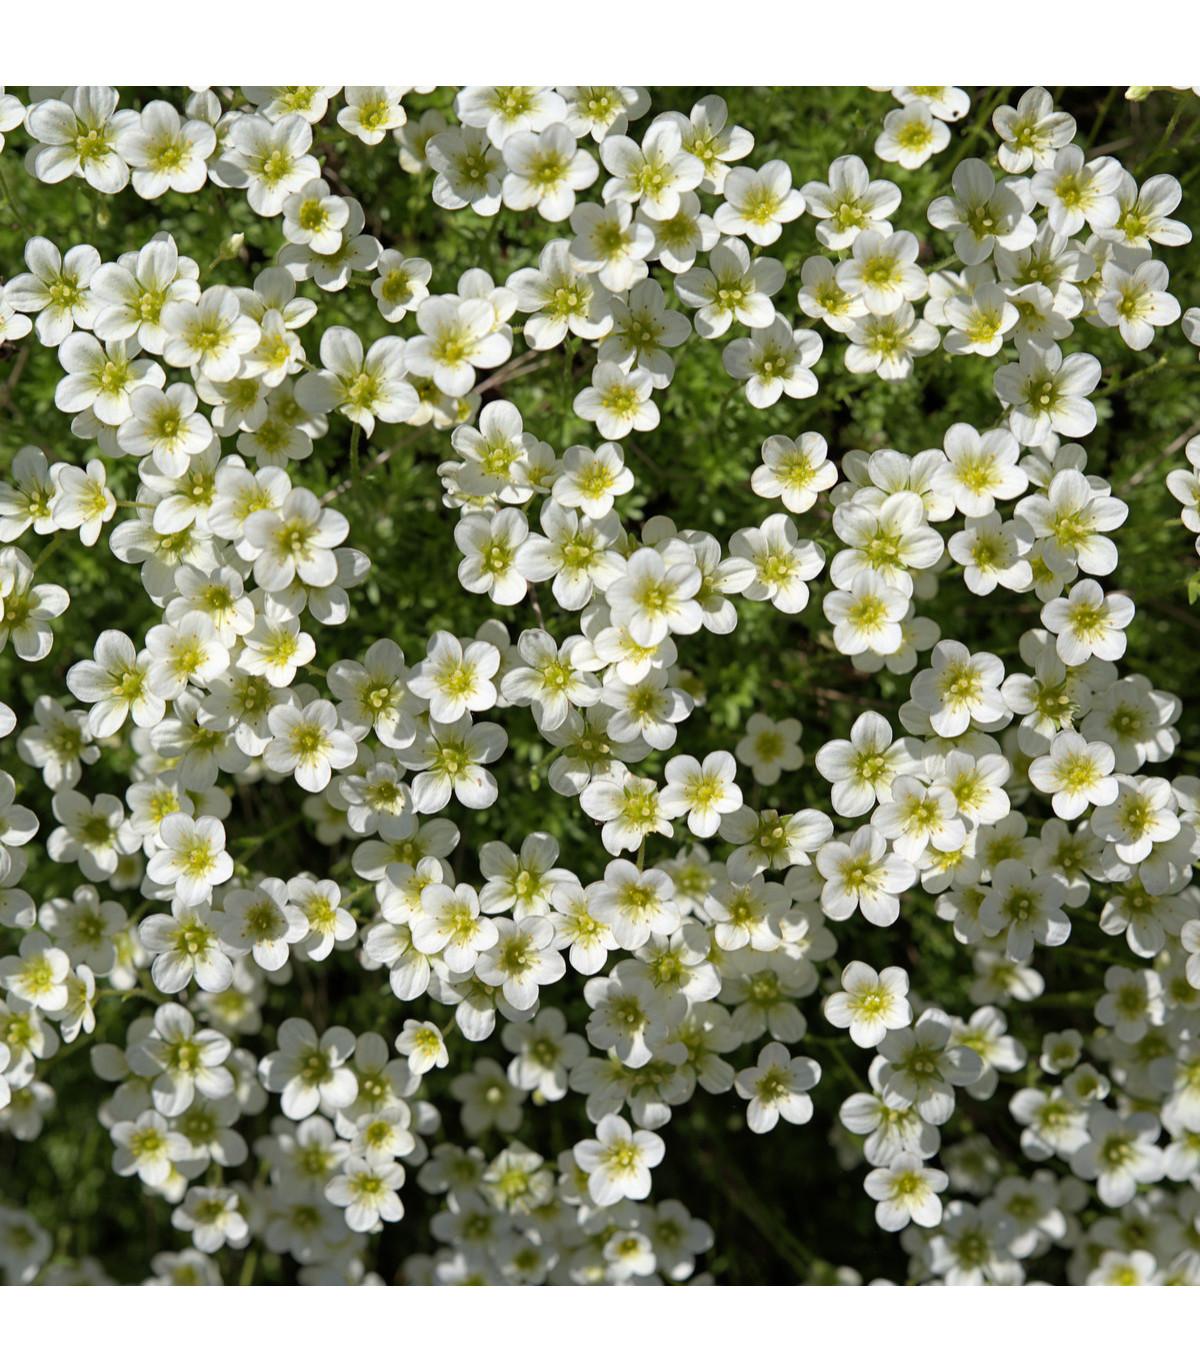 Úrazník šídlovitý - Sagina subulata - prodej semen do skalky - 0,01 g